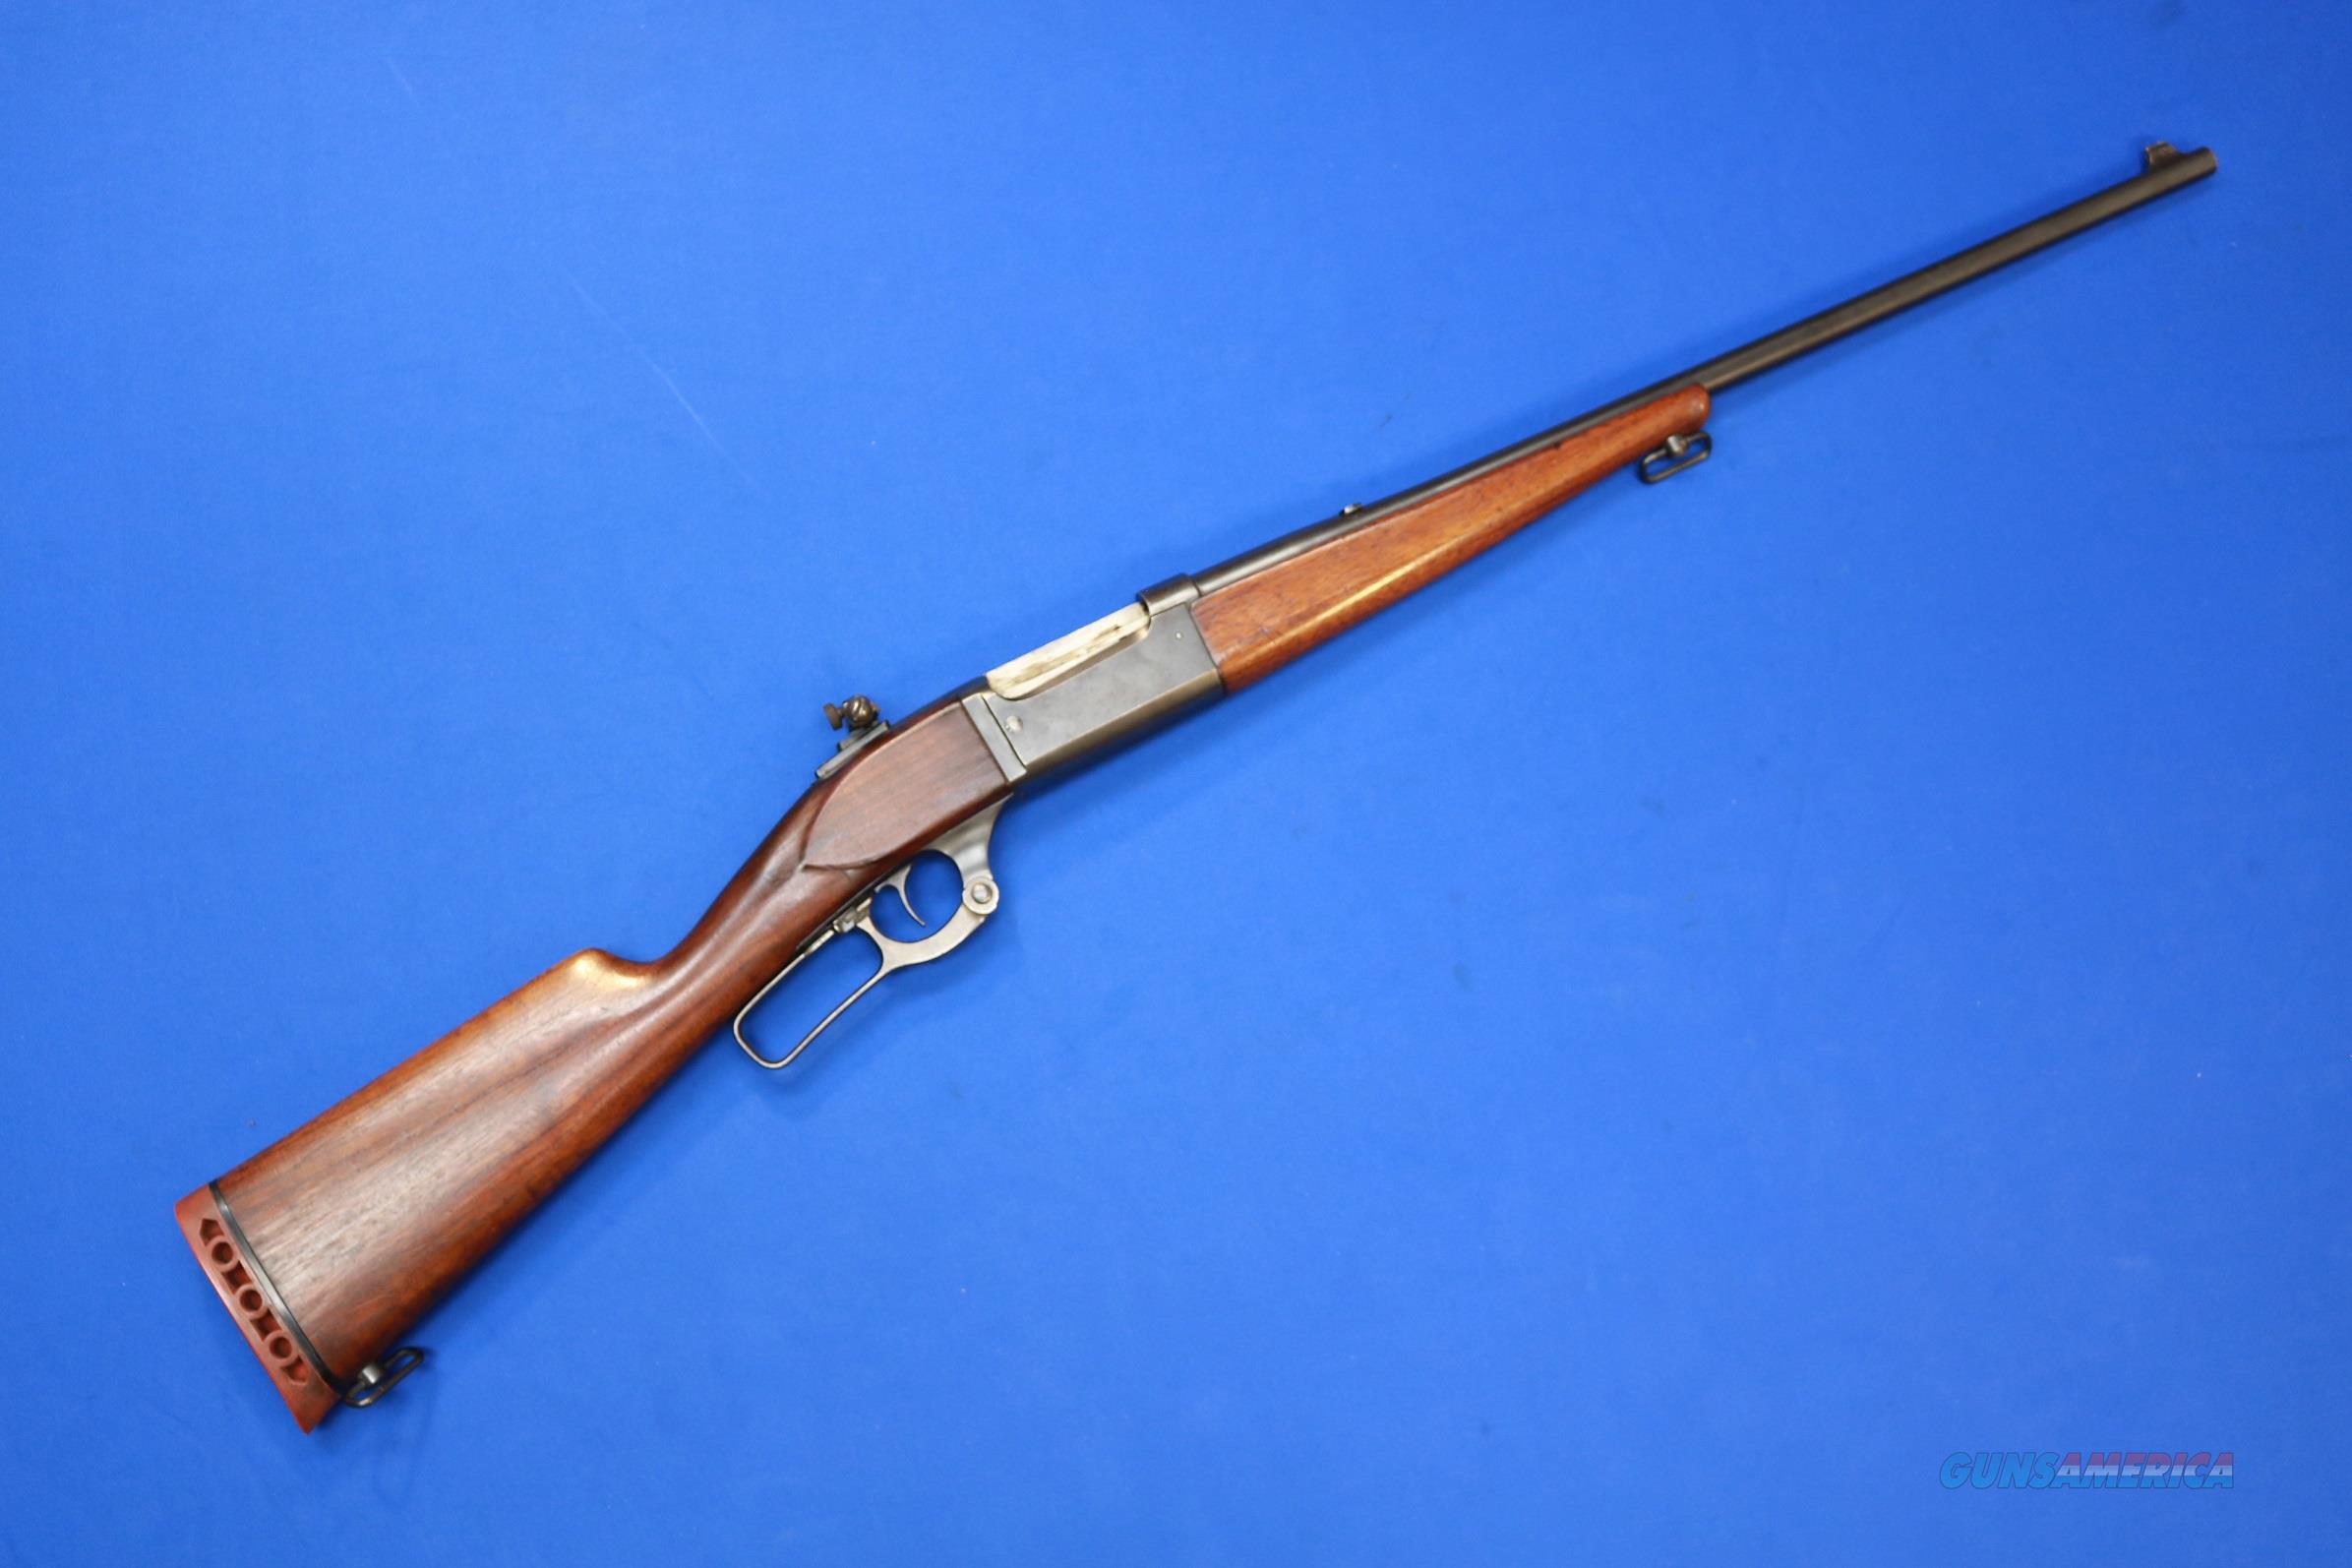 SAVAGE 99 LEVER ACTION .300 SAVAGE w/PEEP SIGHT  Guns > Rifles > Savage Rifles > Model 95/99 Family